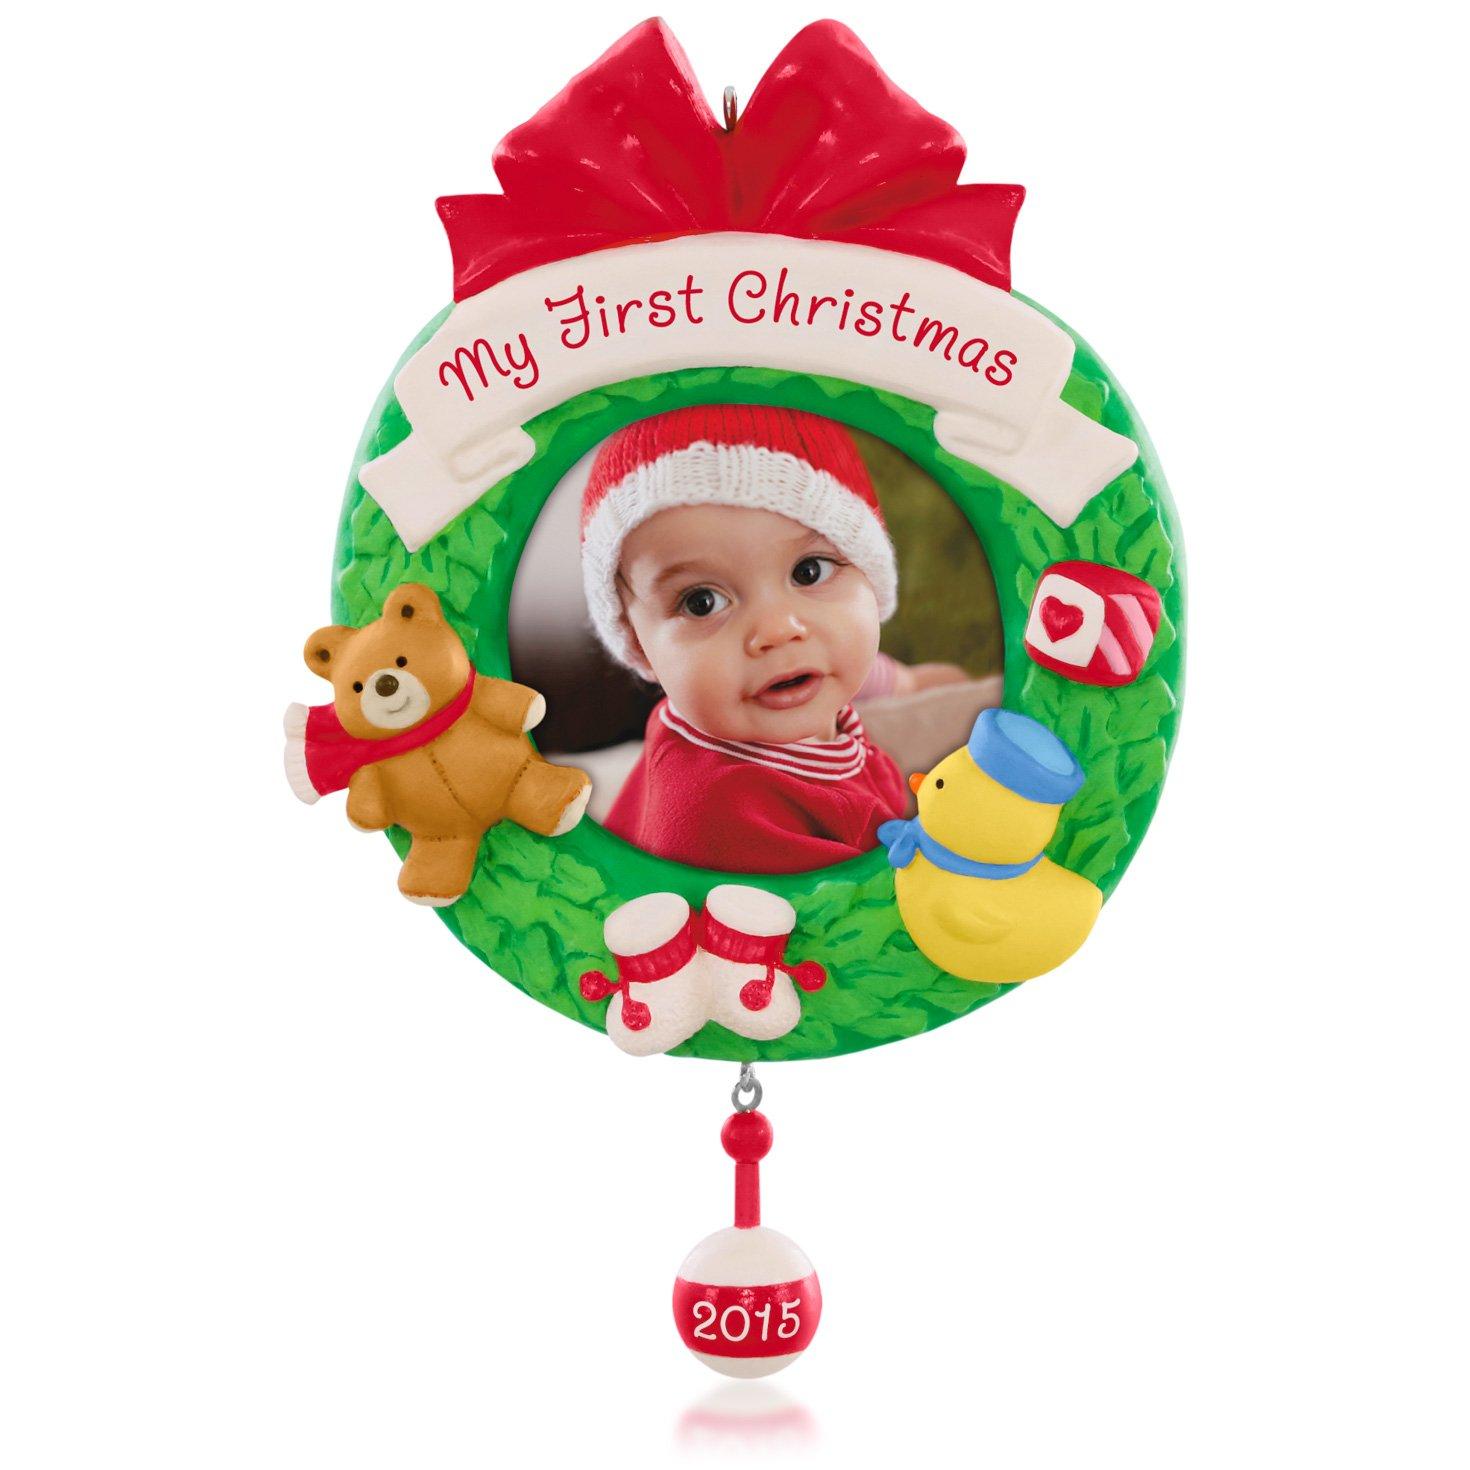 Hallmark Keepsake Ornament: My First Christmas Photo Frame-Holder for Baby